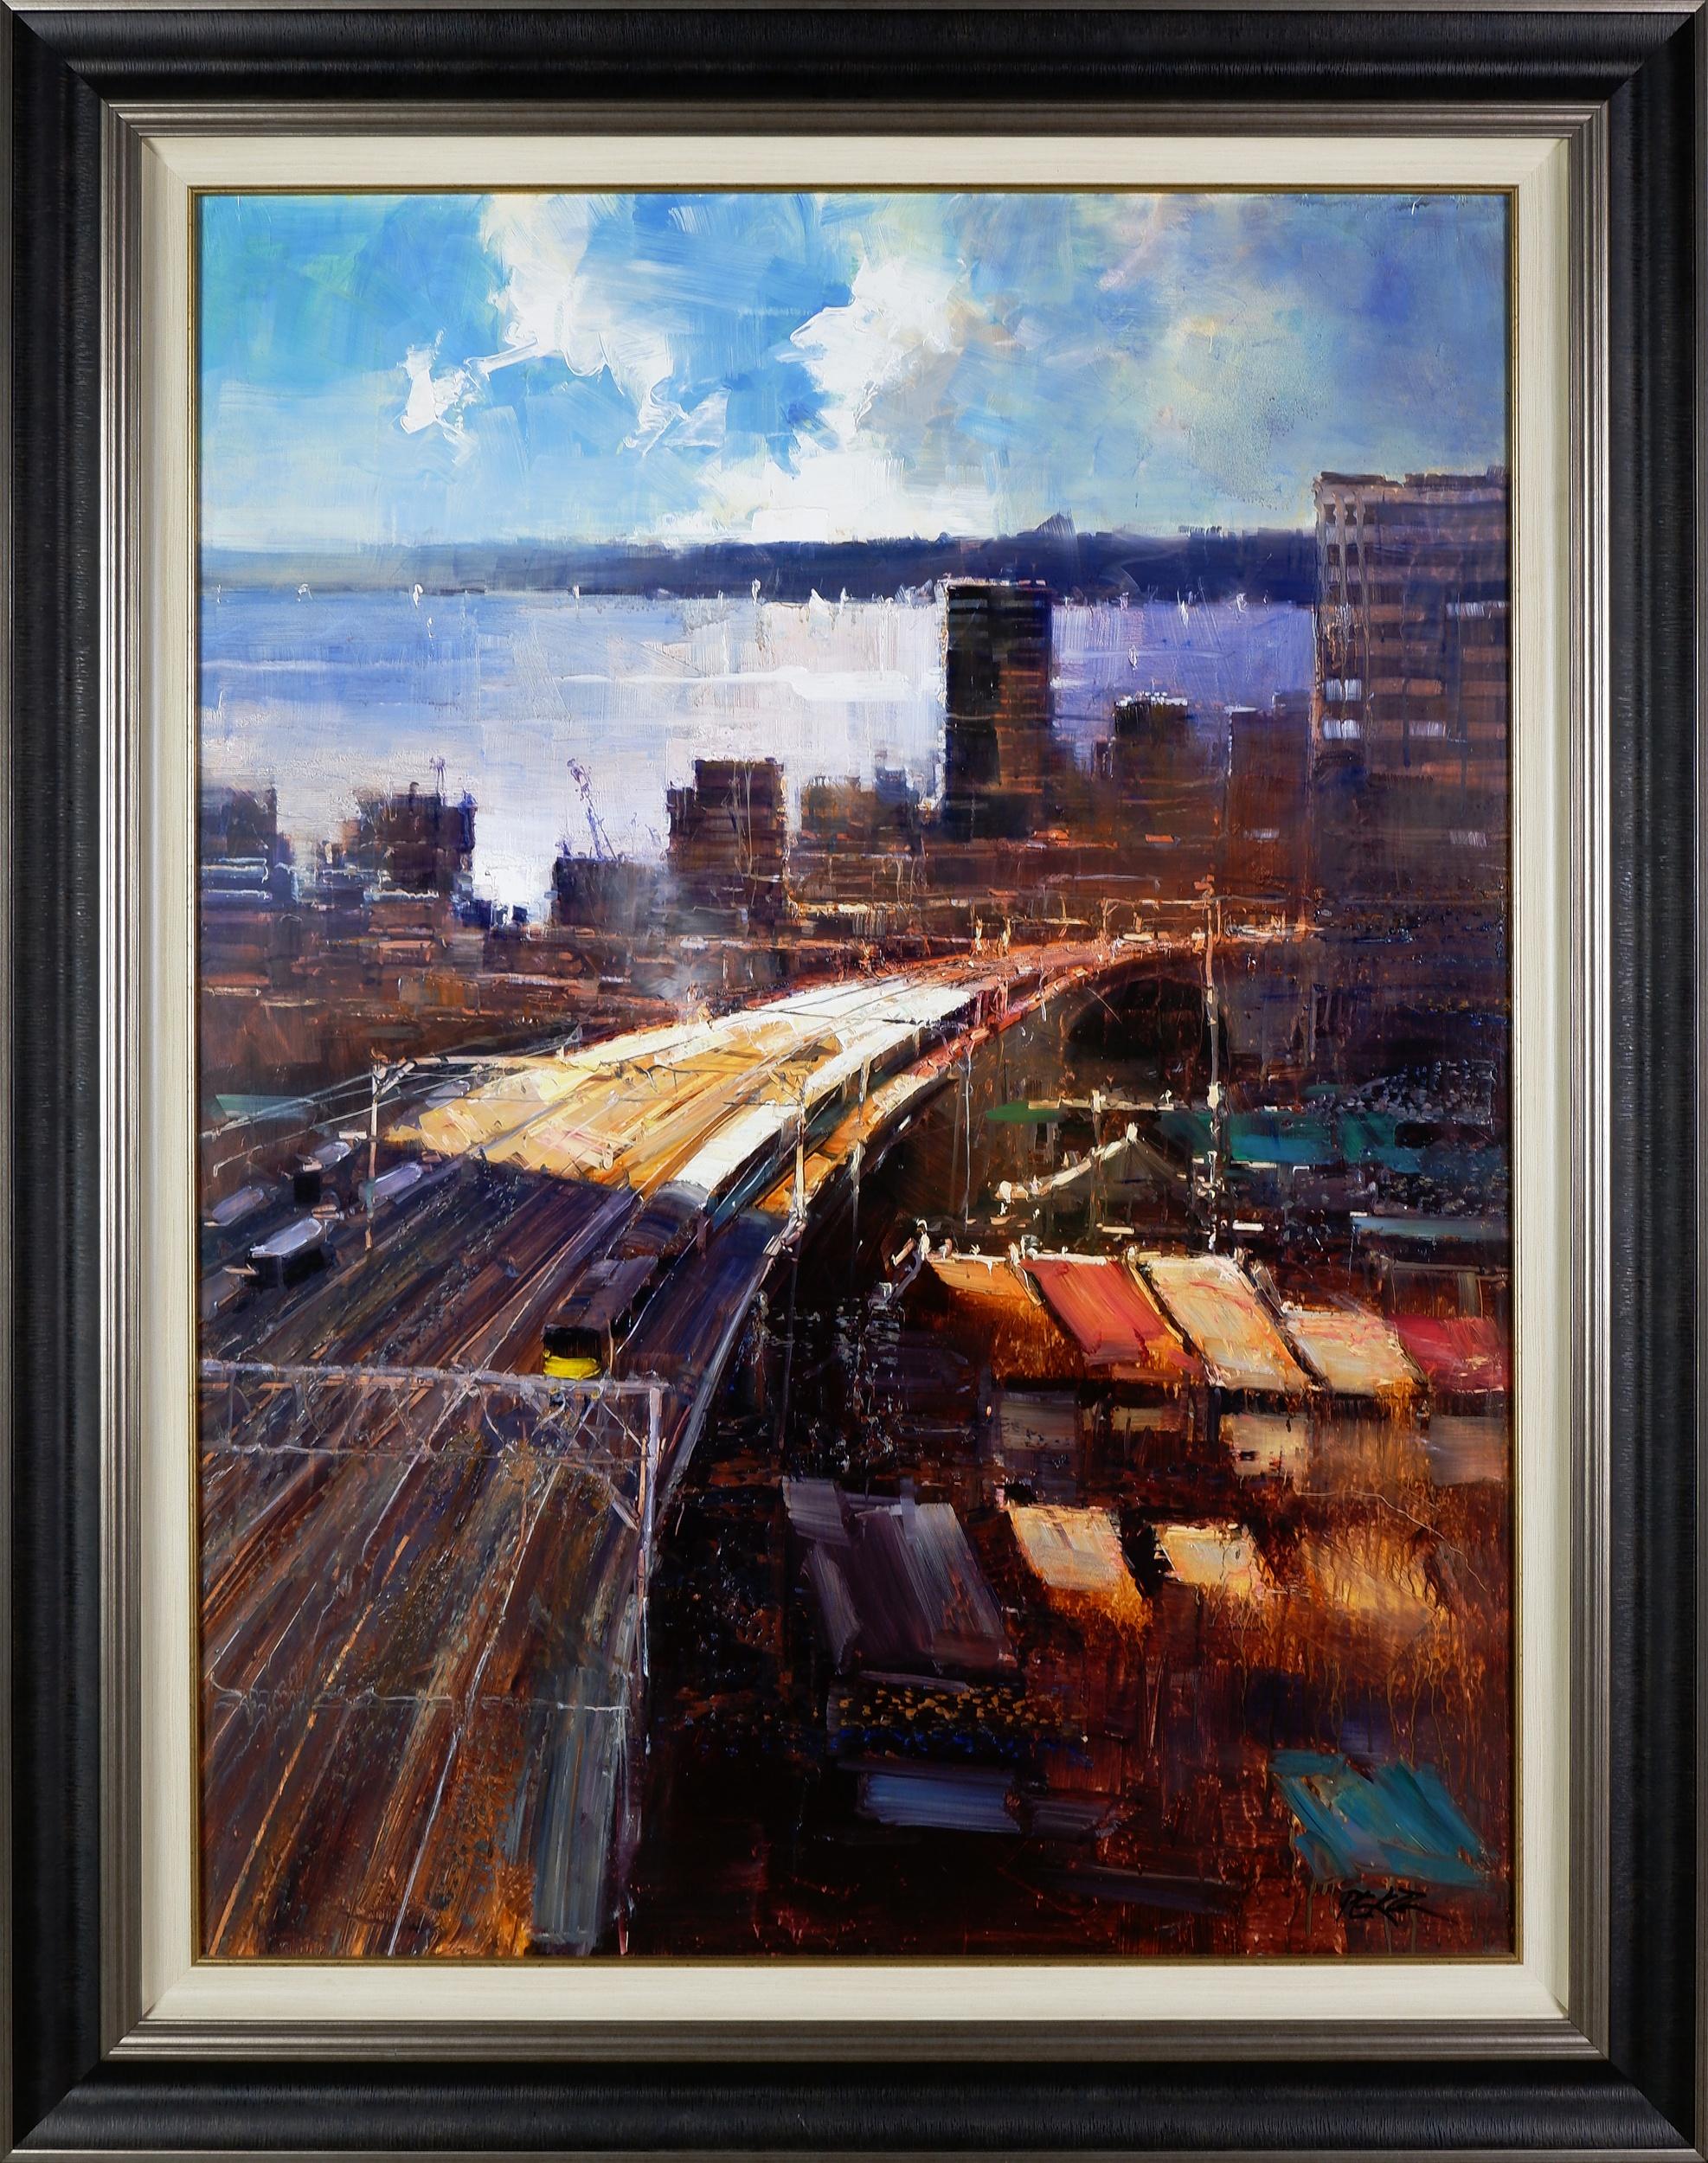 'Herman Pekel (born 1956), Untitled (Harbour View), Oil on Board, 120 x 90 cm'